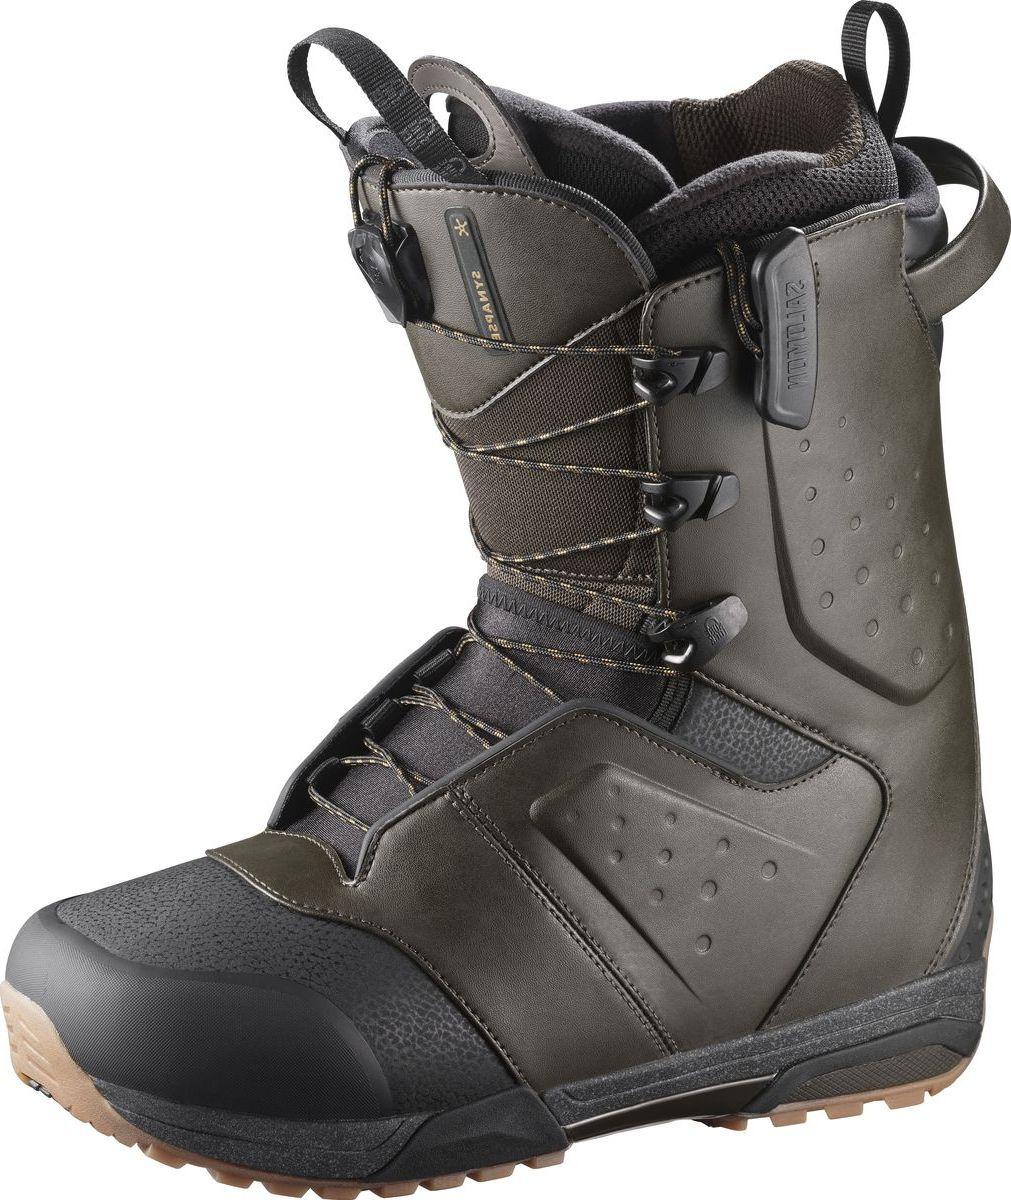 "Ботинки для сноуборда Salomon ""Synapse"", цвет: темно-зеленый. Размер 27,5 (42)"